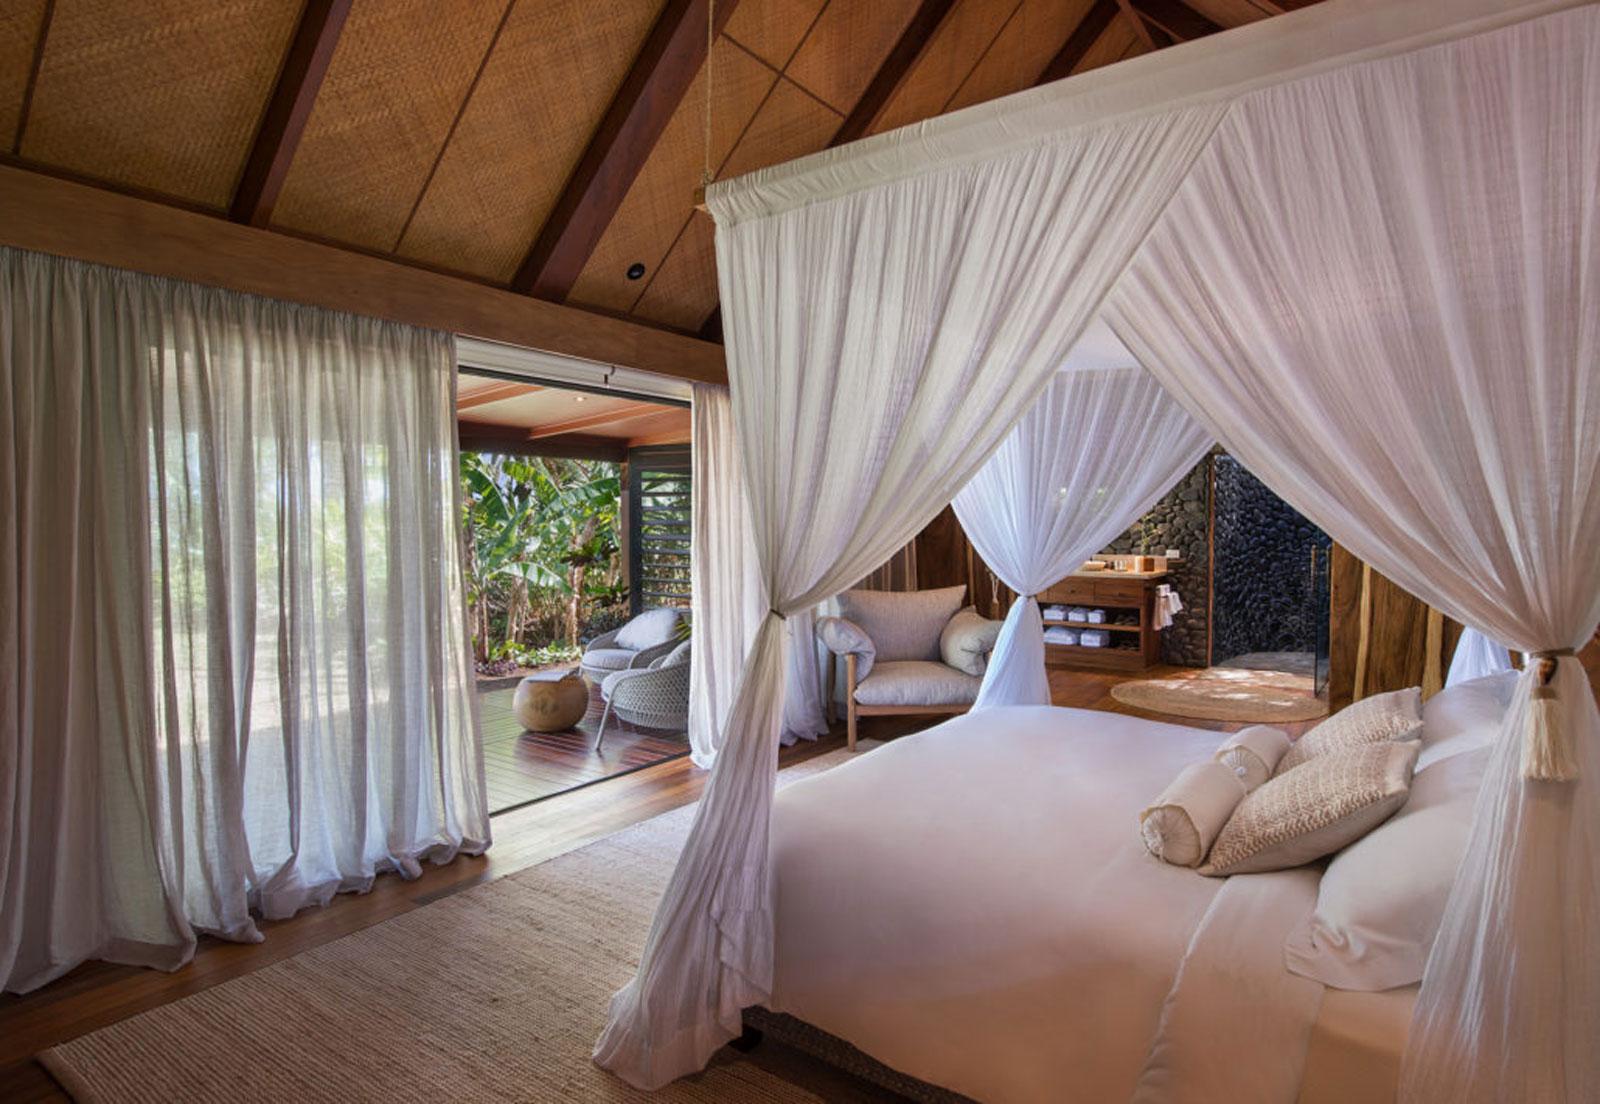 Wedding-&-Honeymoon-Resorts-in-the-lomaiviti-islands